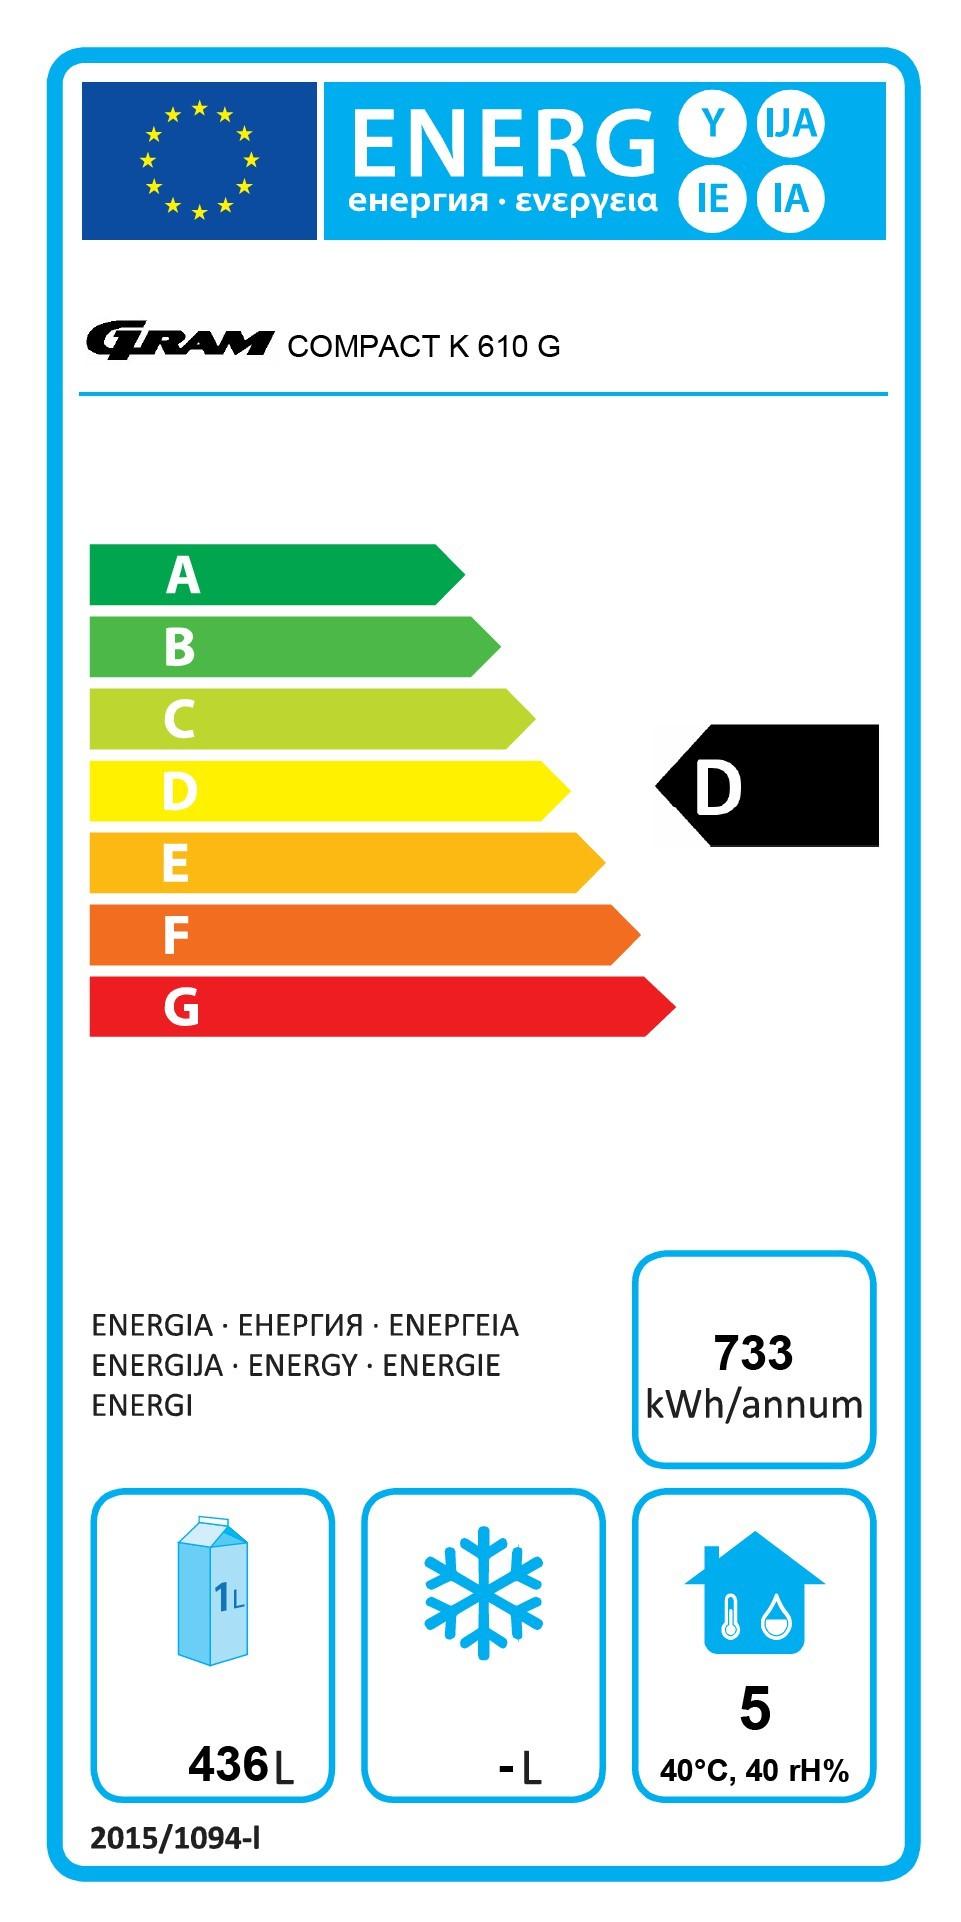 COMPACT K 610 RG C 4N 513 Ltr Stainless Steel Single Door Upright Fridge Energy Rating